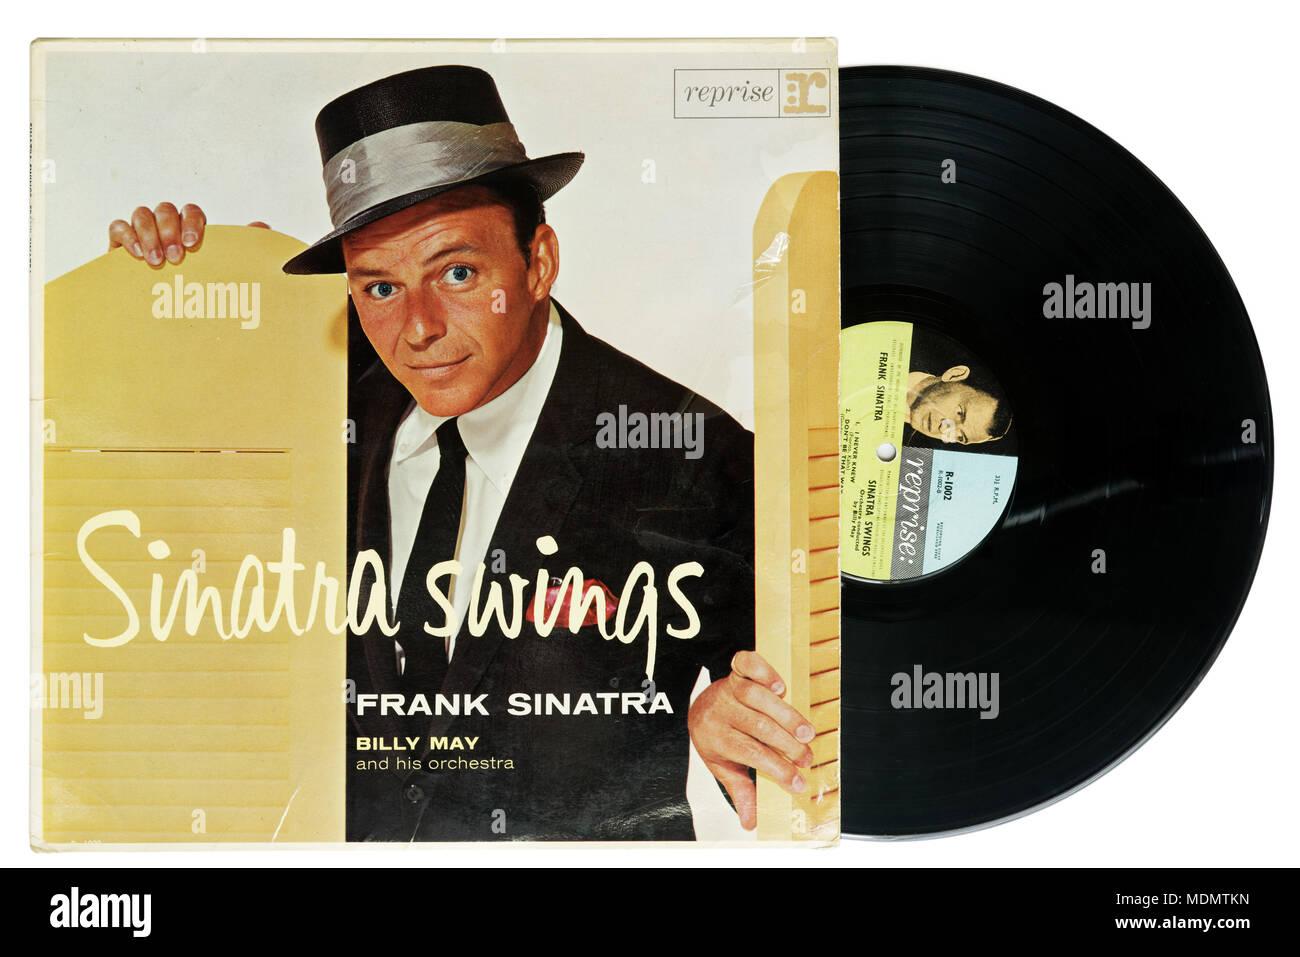 Sinatra Swings album by Frank Sinatra - Stock Image